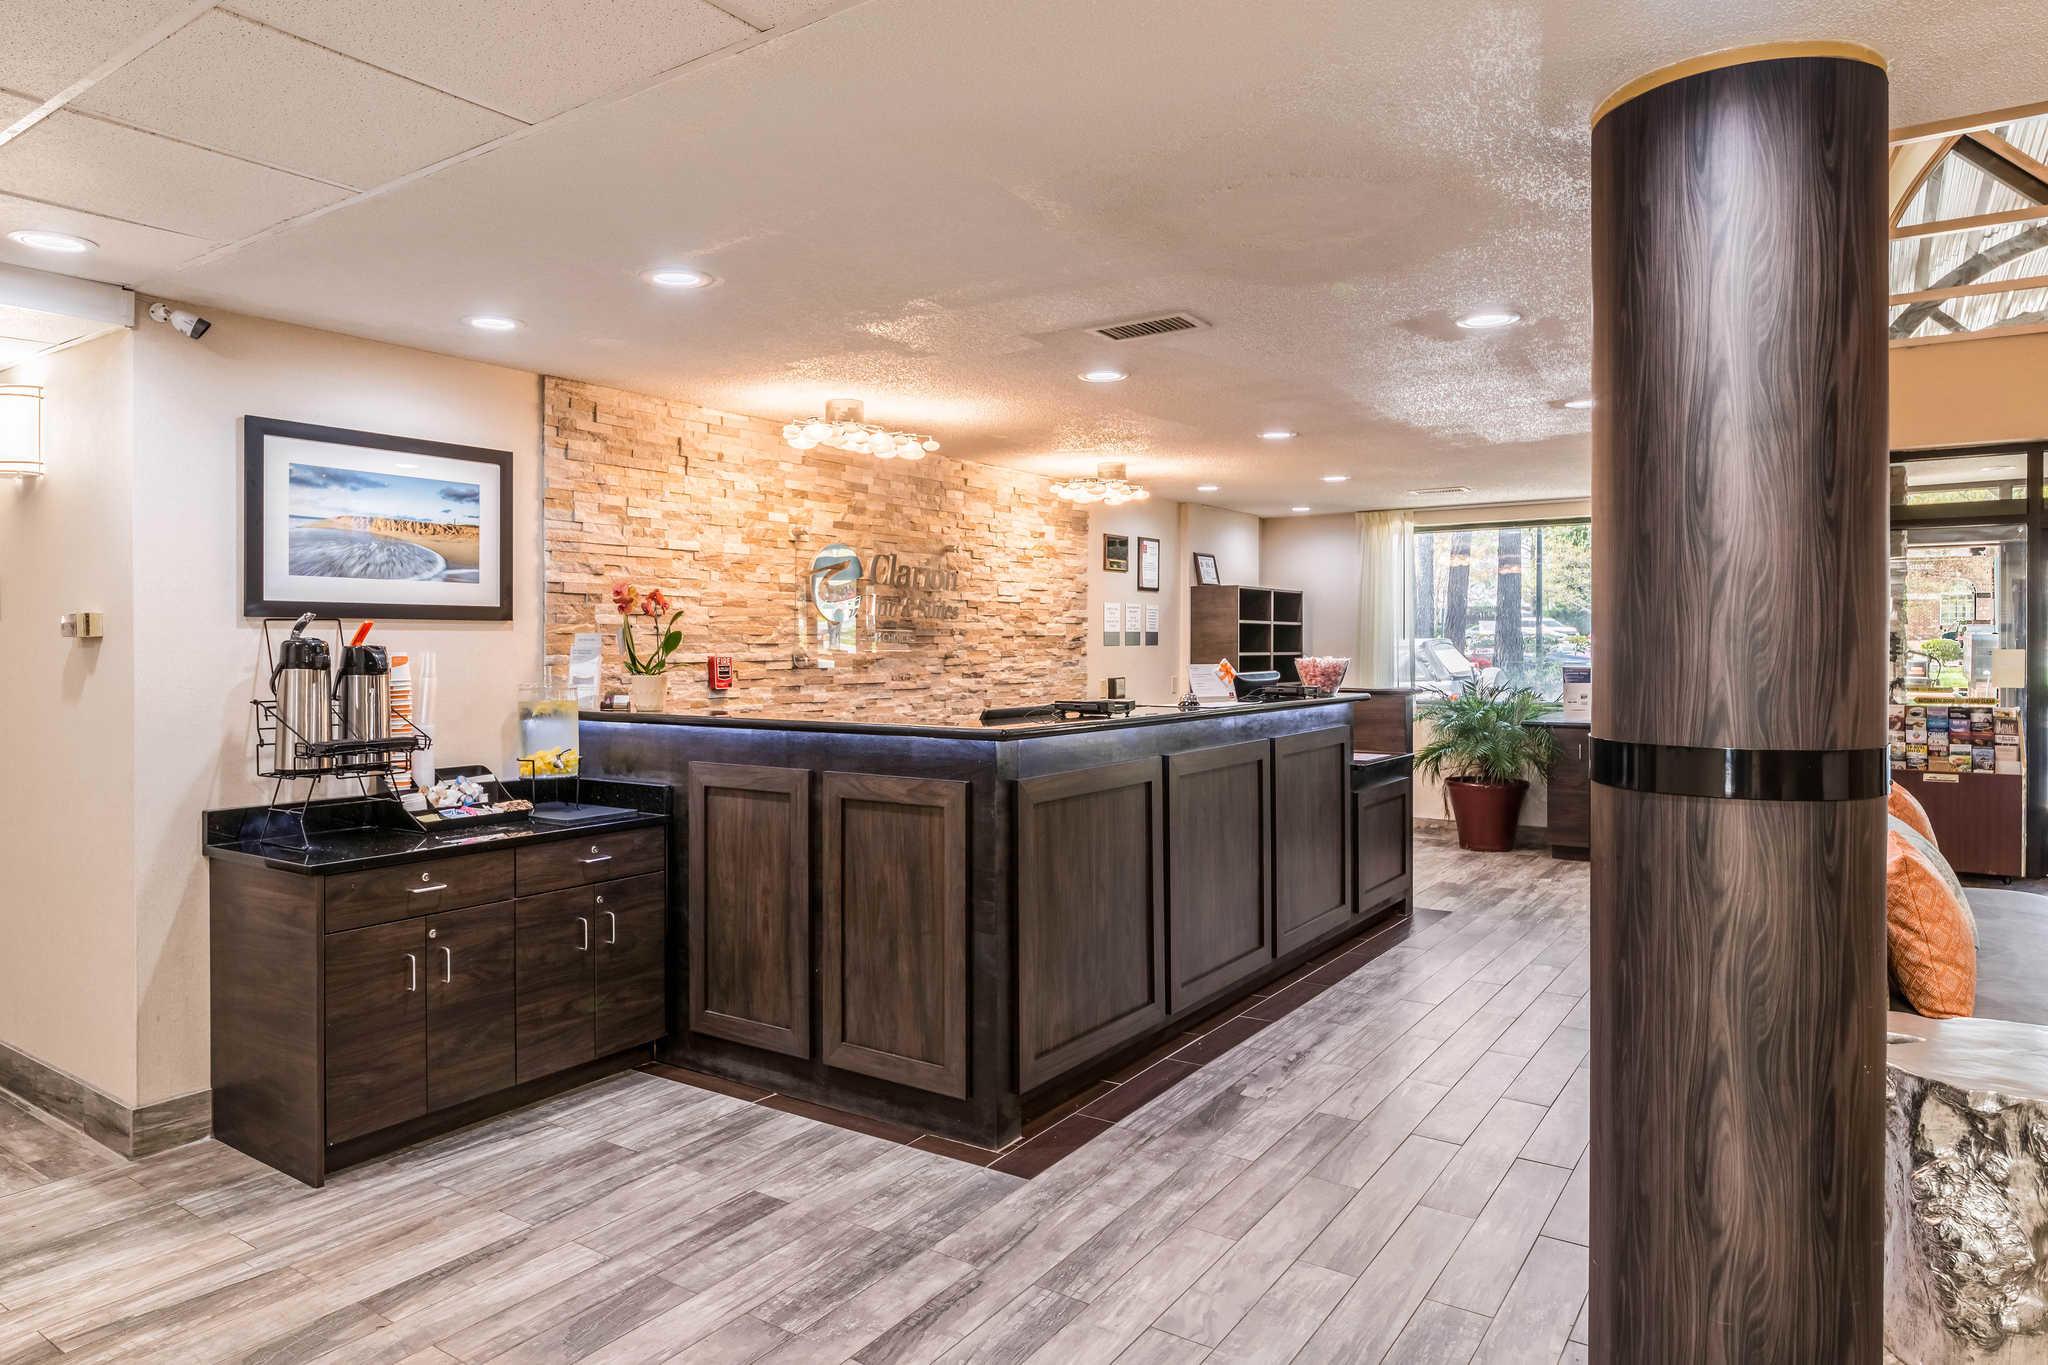 Clarion Inn & Suites image 5